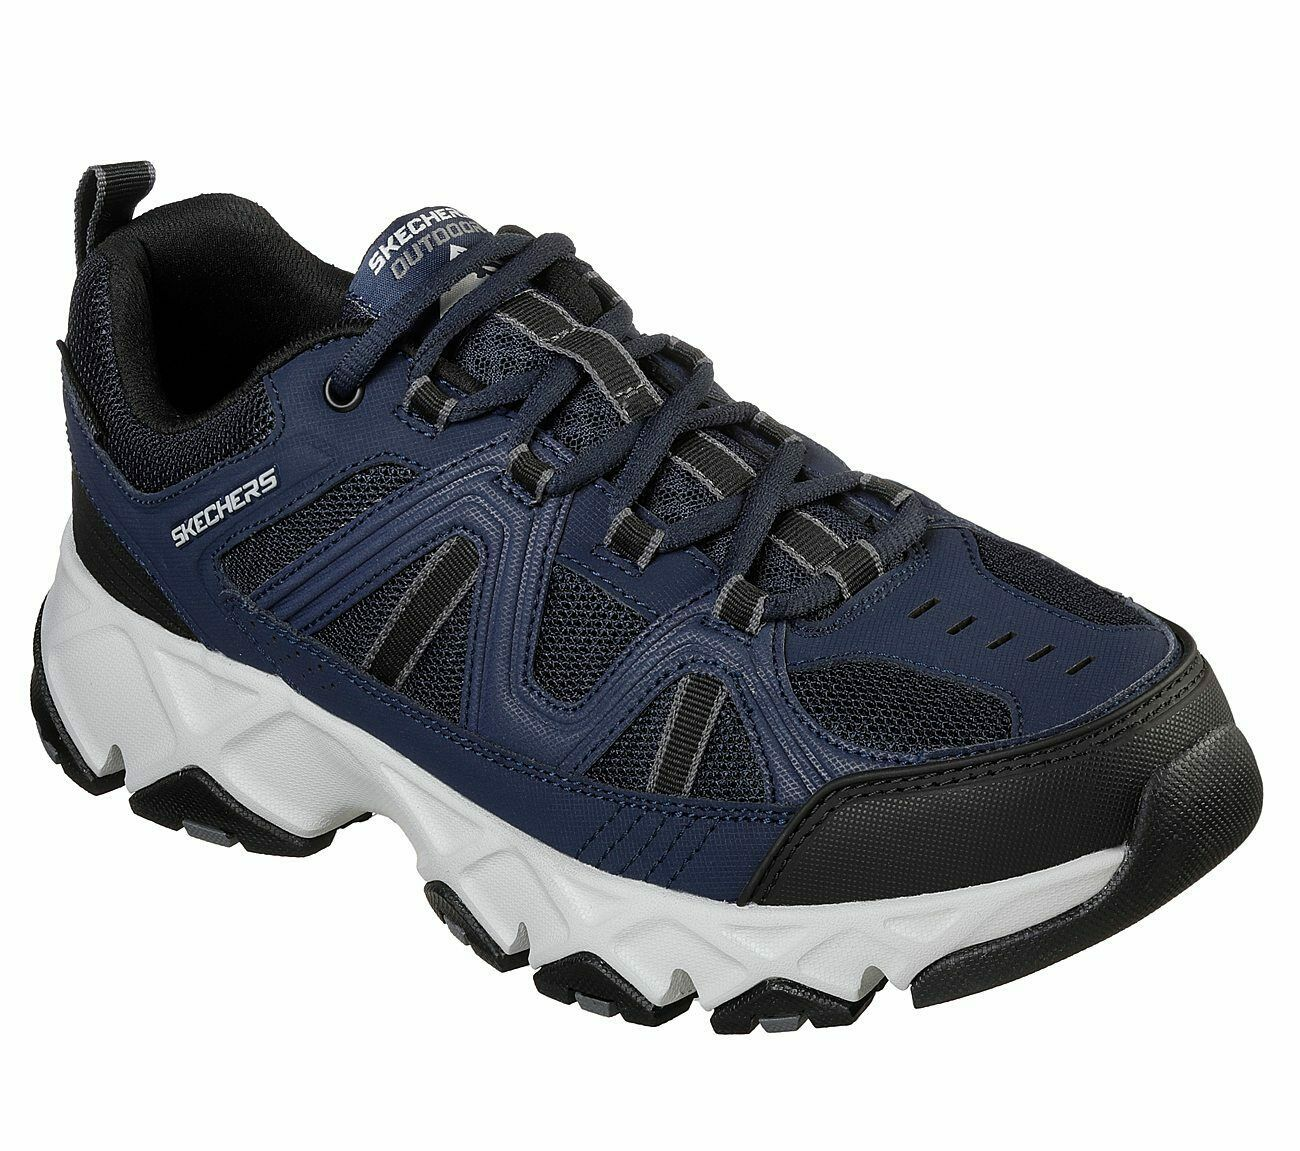 Skechers Navy Black Extra Wide Fit Shoe Men Memory Foam Sport Comfort Soft 51885